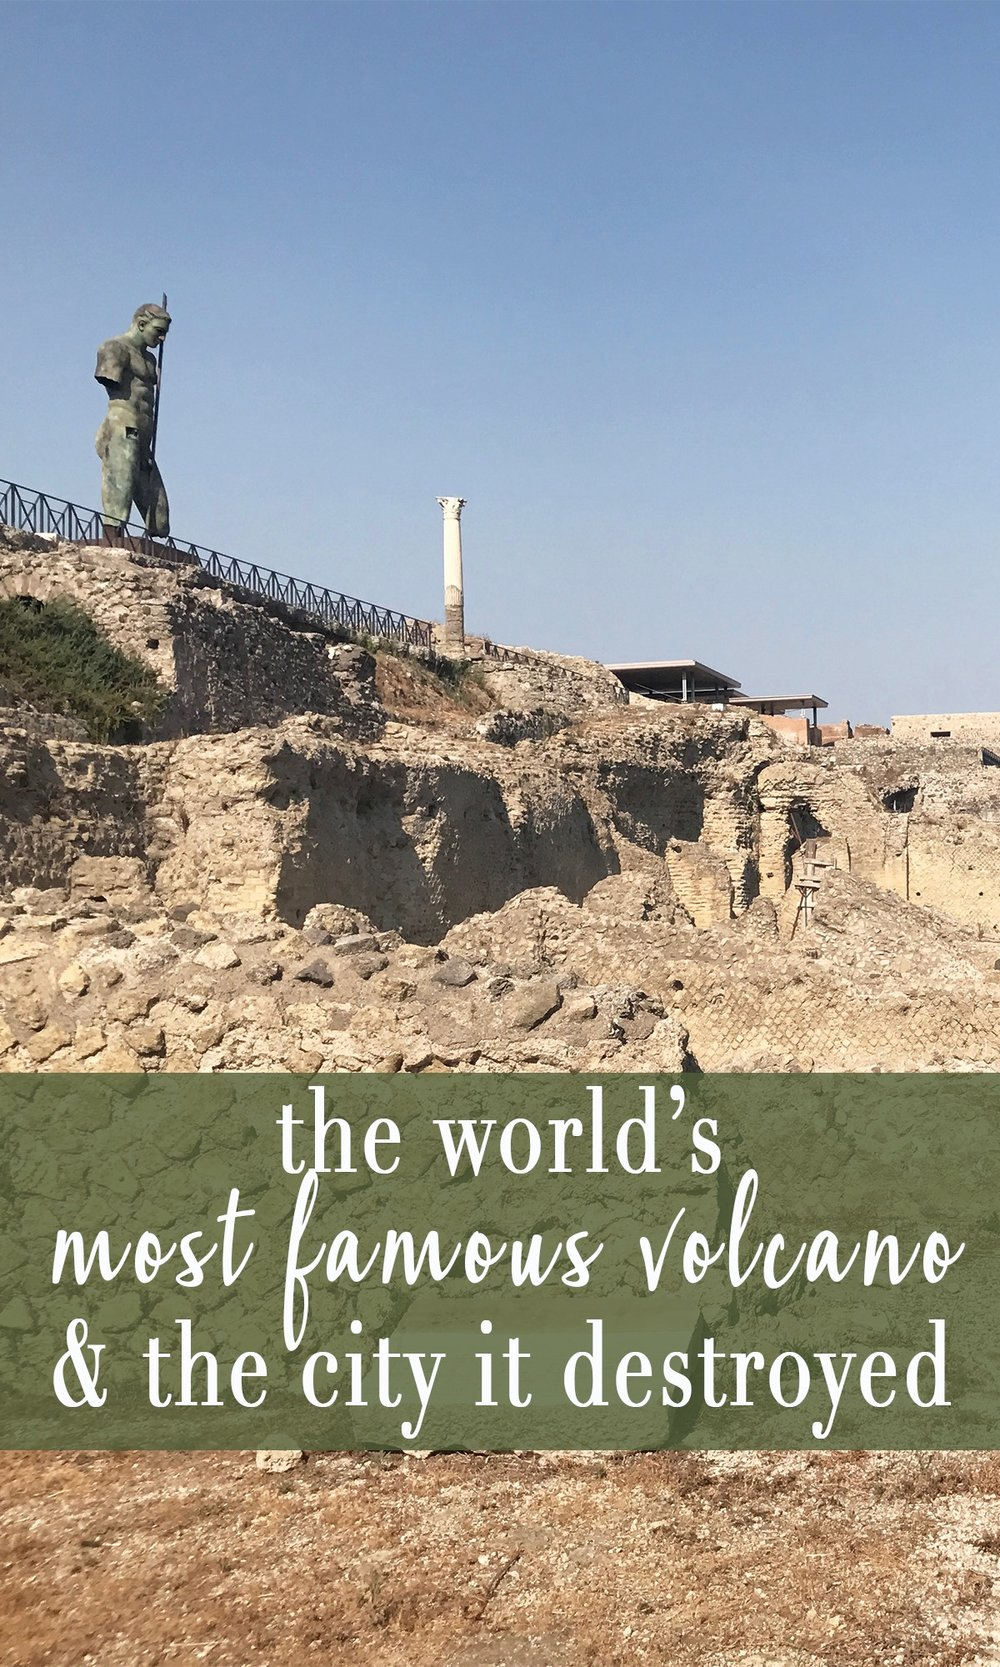 Mount-Vesuvius-Pompei-Italy.jpg